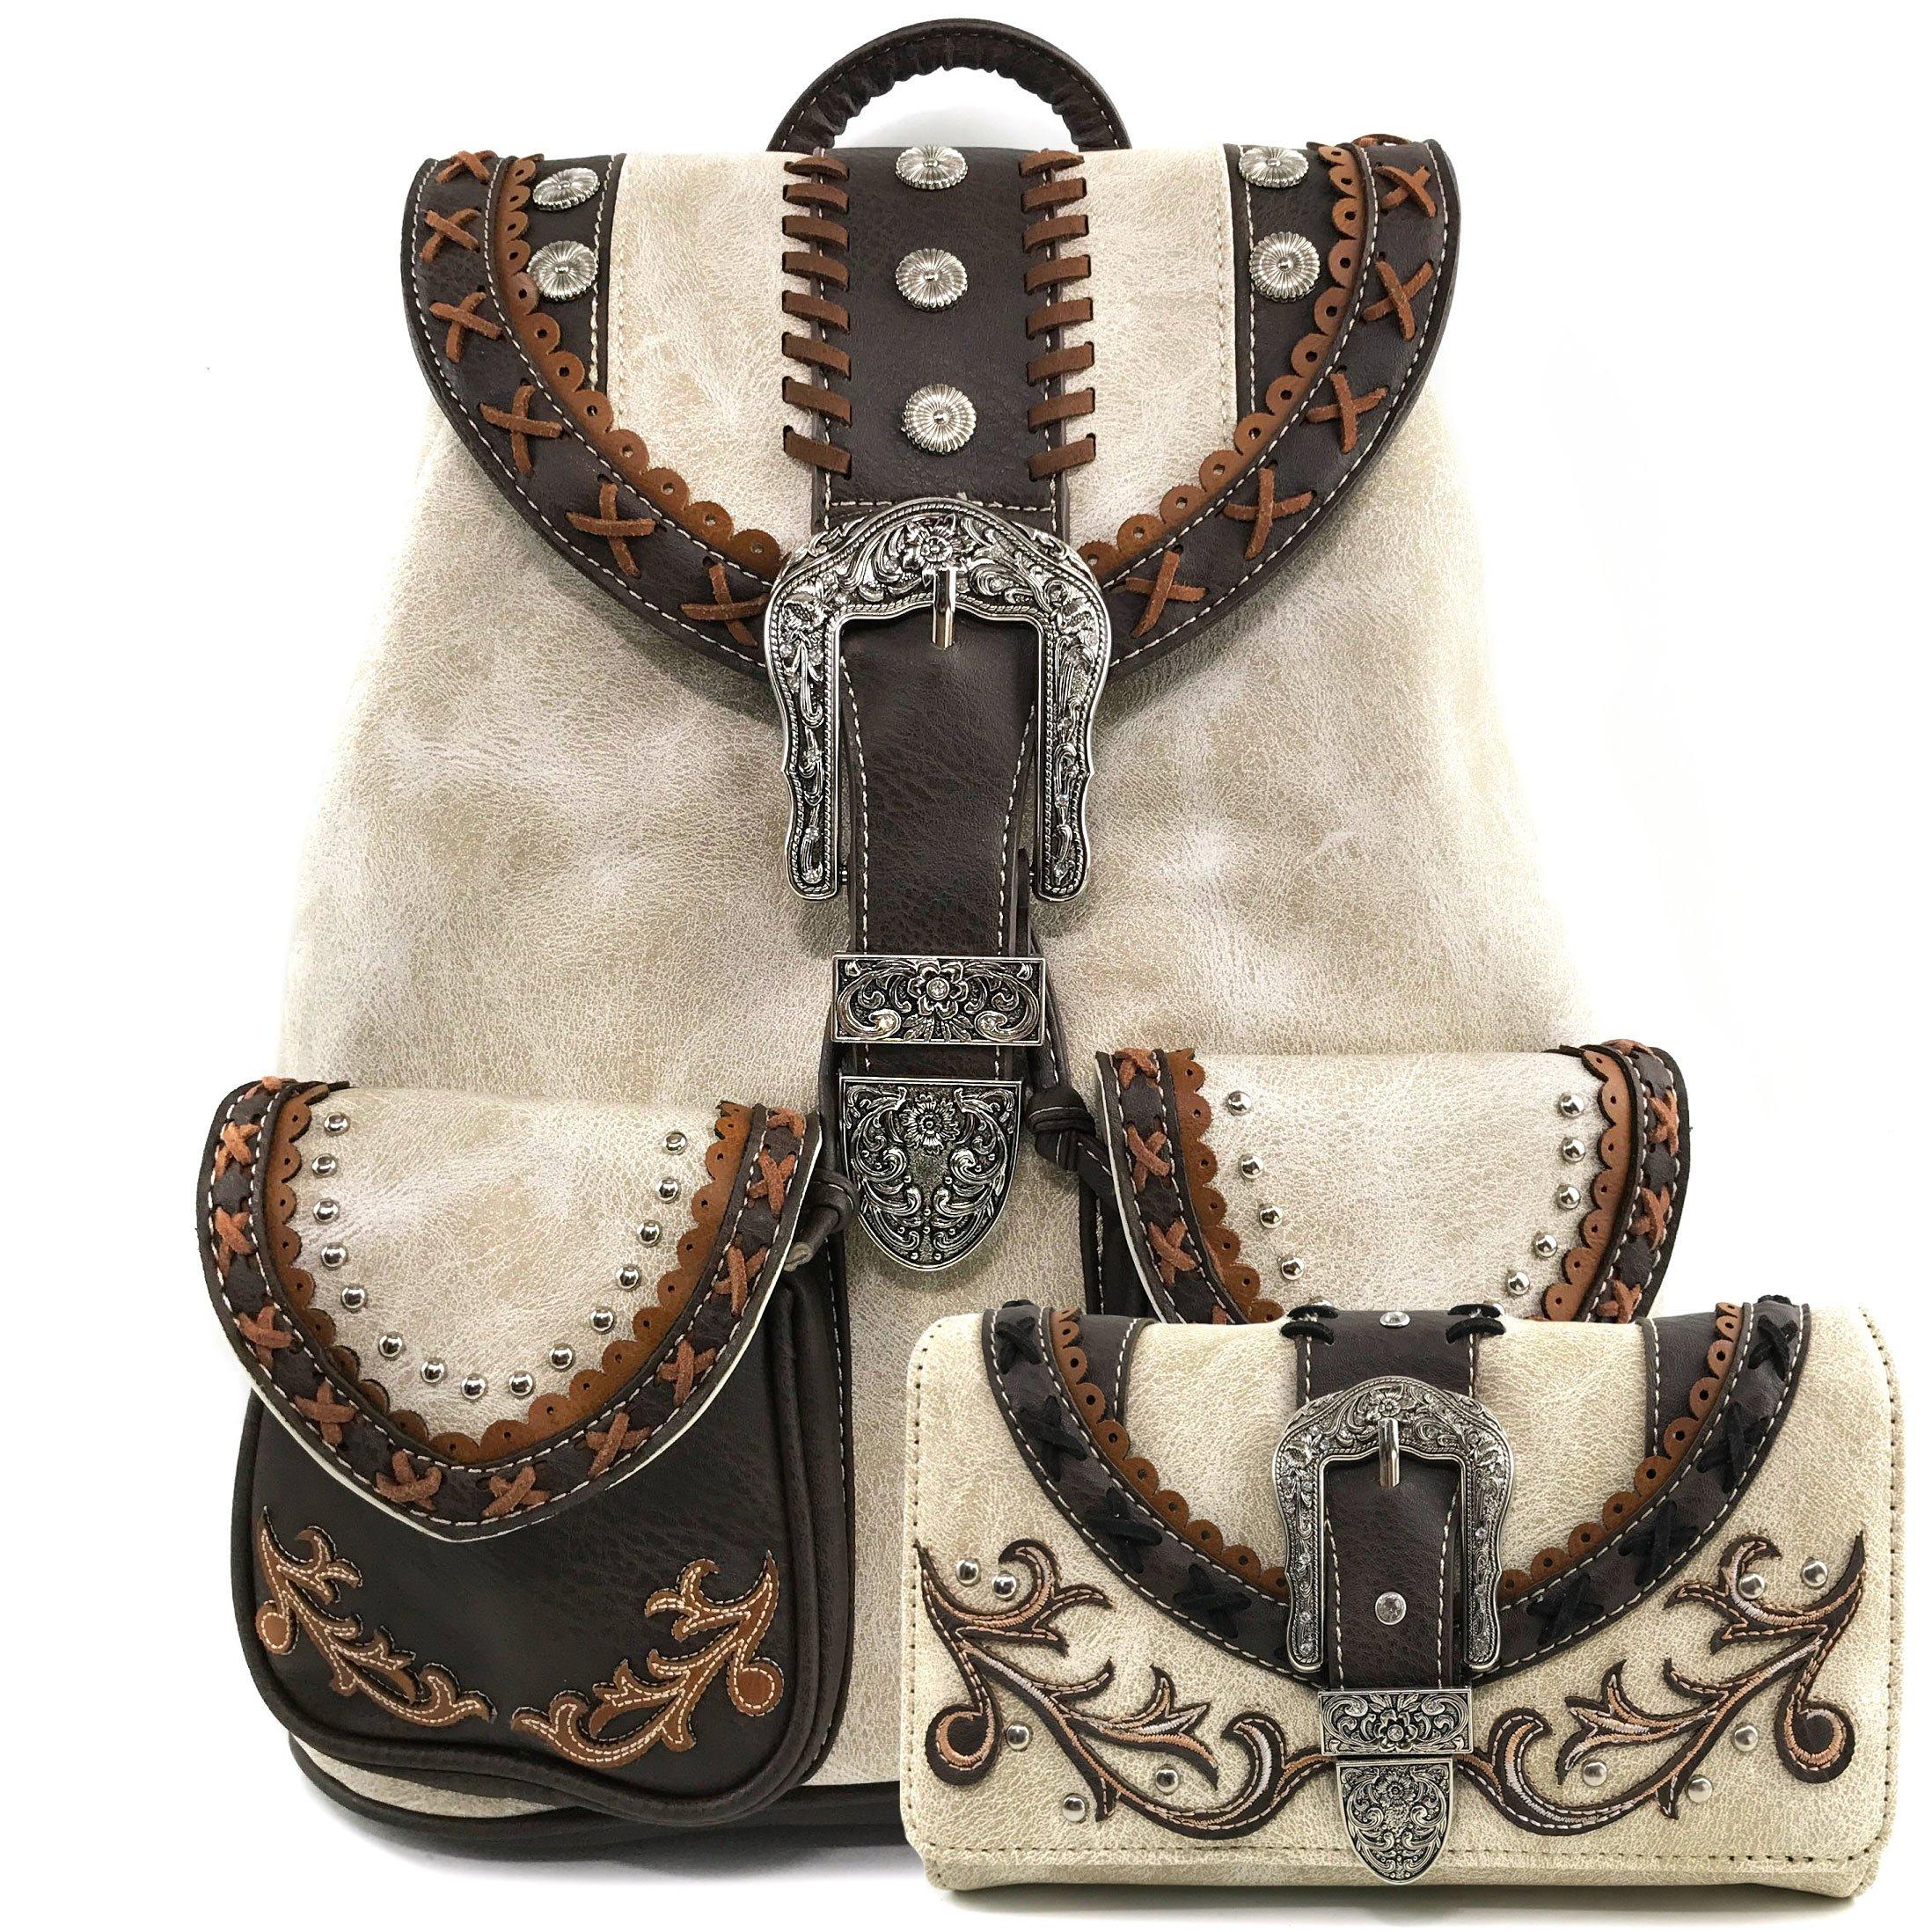 Justin West Trendy Western Rhinestone Leather Conceal Carry Top Handle Backpack Purse (Western Beige Backpack Wallet Set) by Justin West